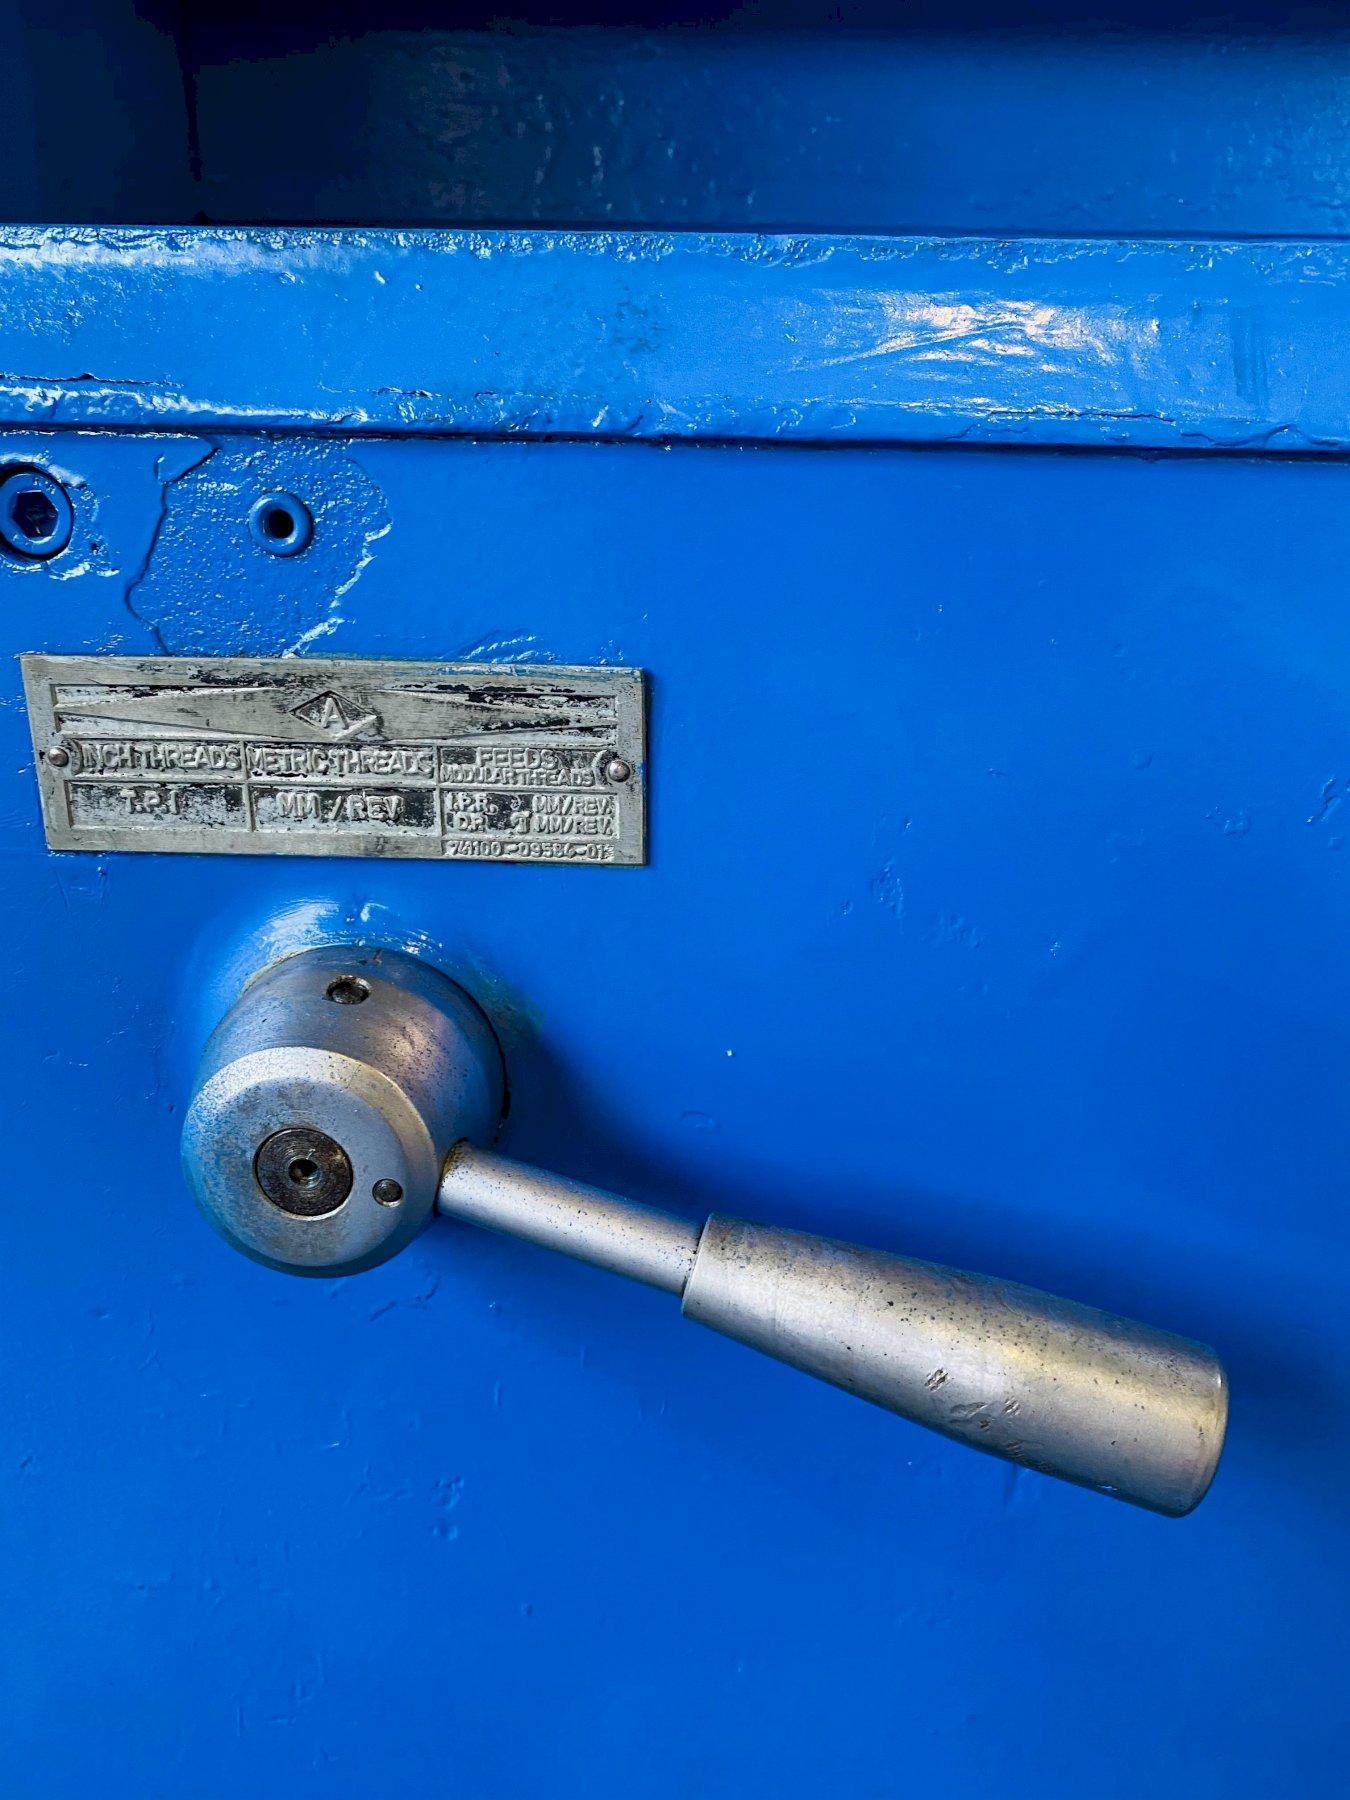 "48"" x 336"" POREBA TR115 ENGINE LATHE. STOCK # 0418021"